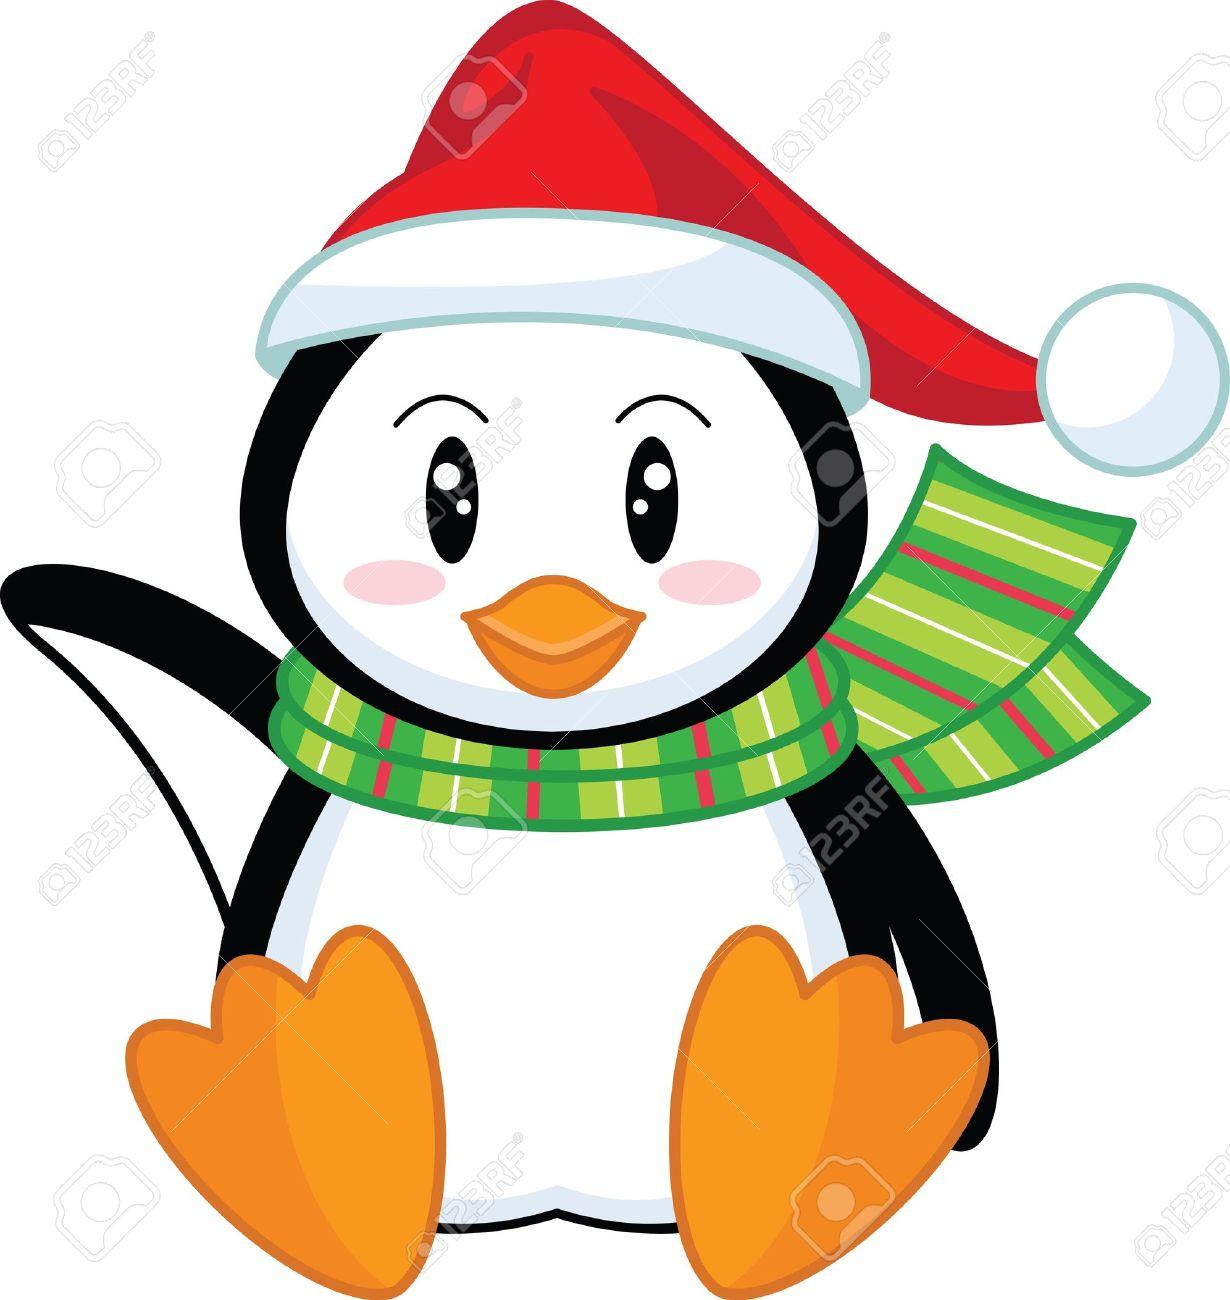 free cartoon holiday clipart  Clipground